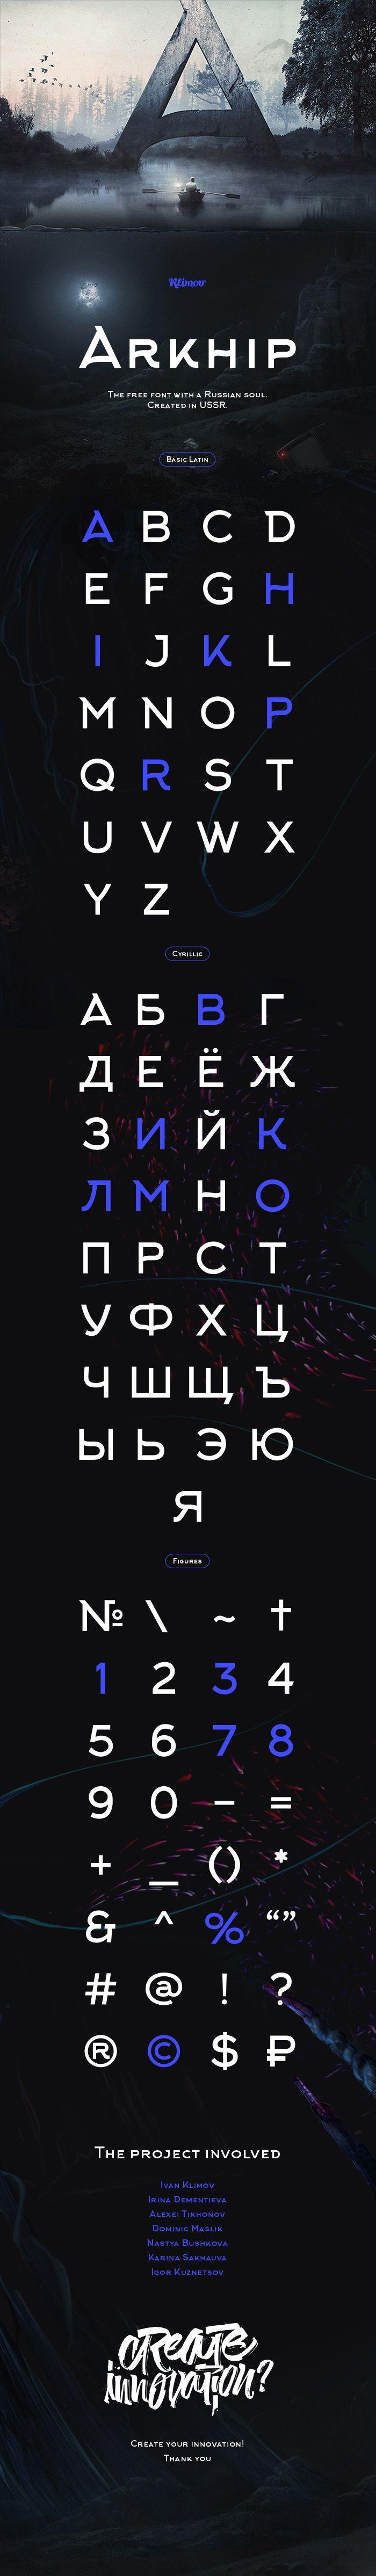 Arkhip font | Fontfabric |  Authors - Ivan Klimov, Irina Dementieva, Alexei Tikhonov Dominic Maslik, Nastya Bushkova, Karina Sakhauva Igor Kuznetsov